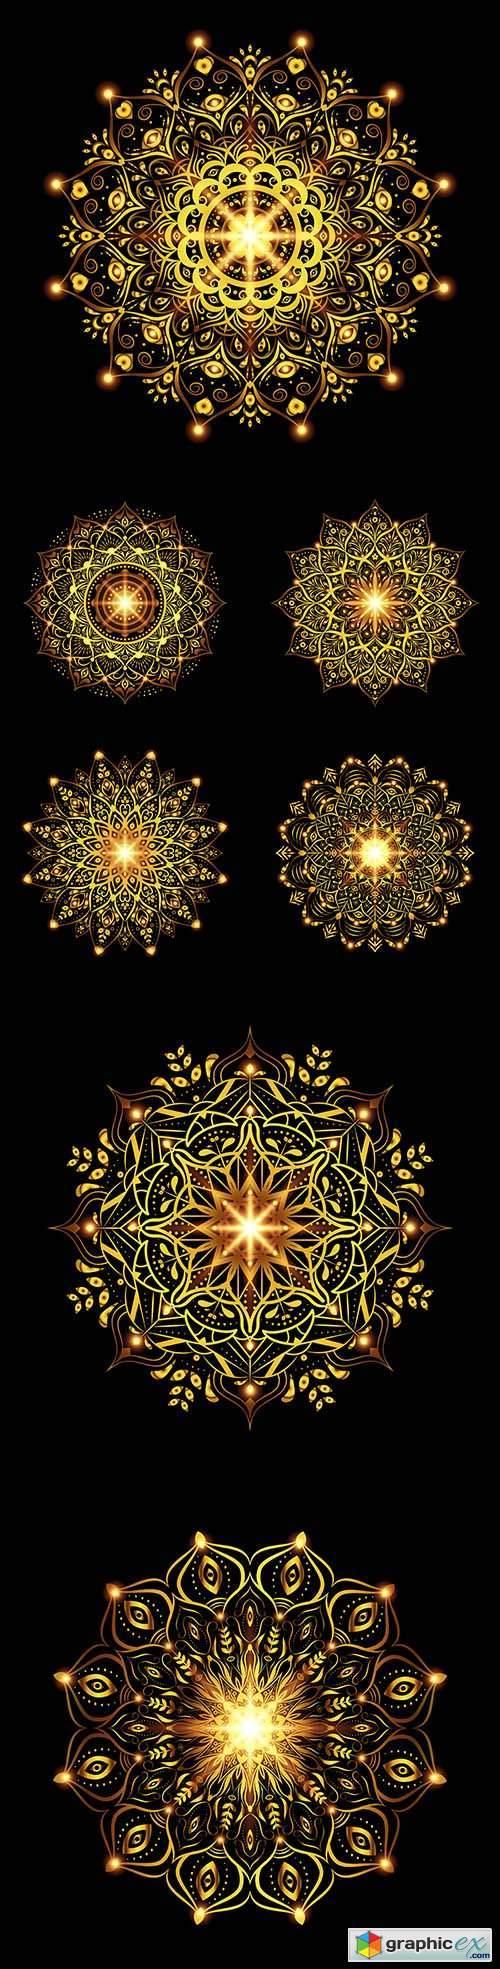 Mandala decorative gold ornament design